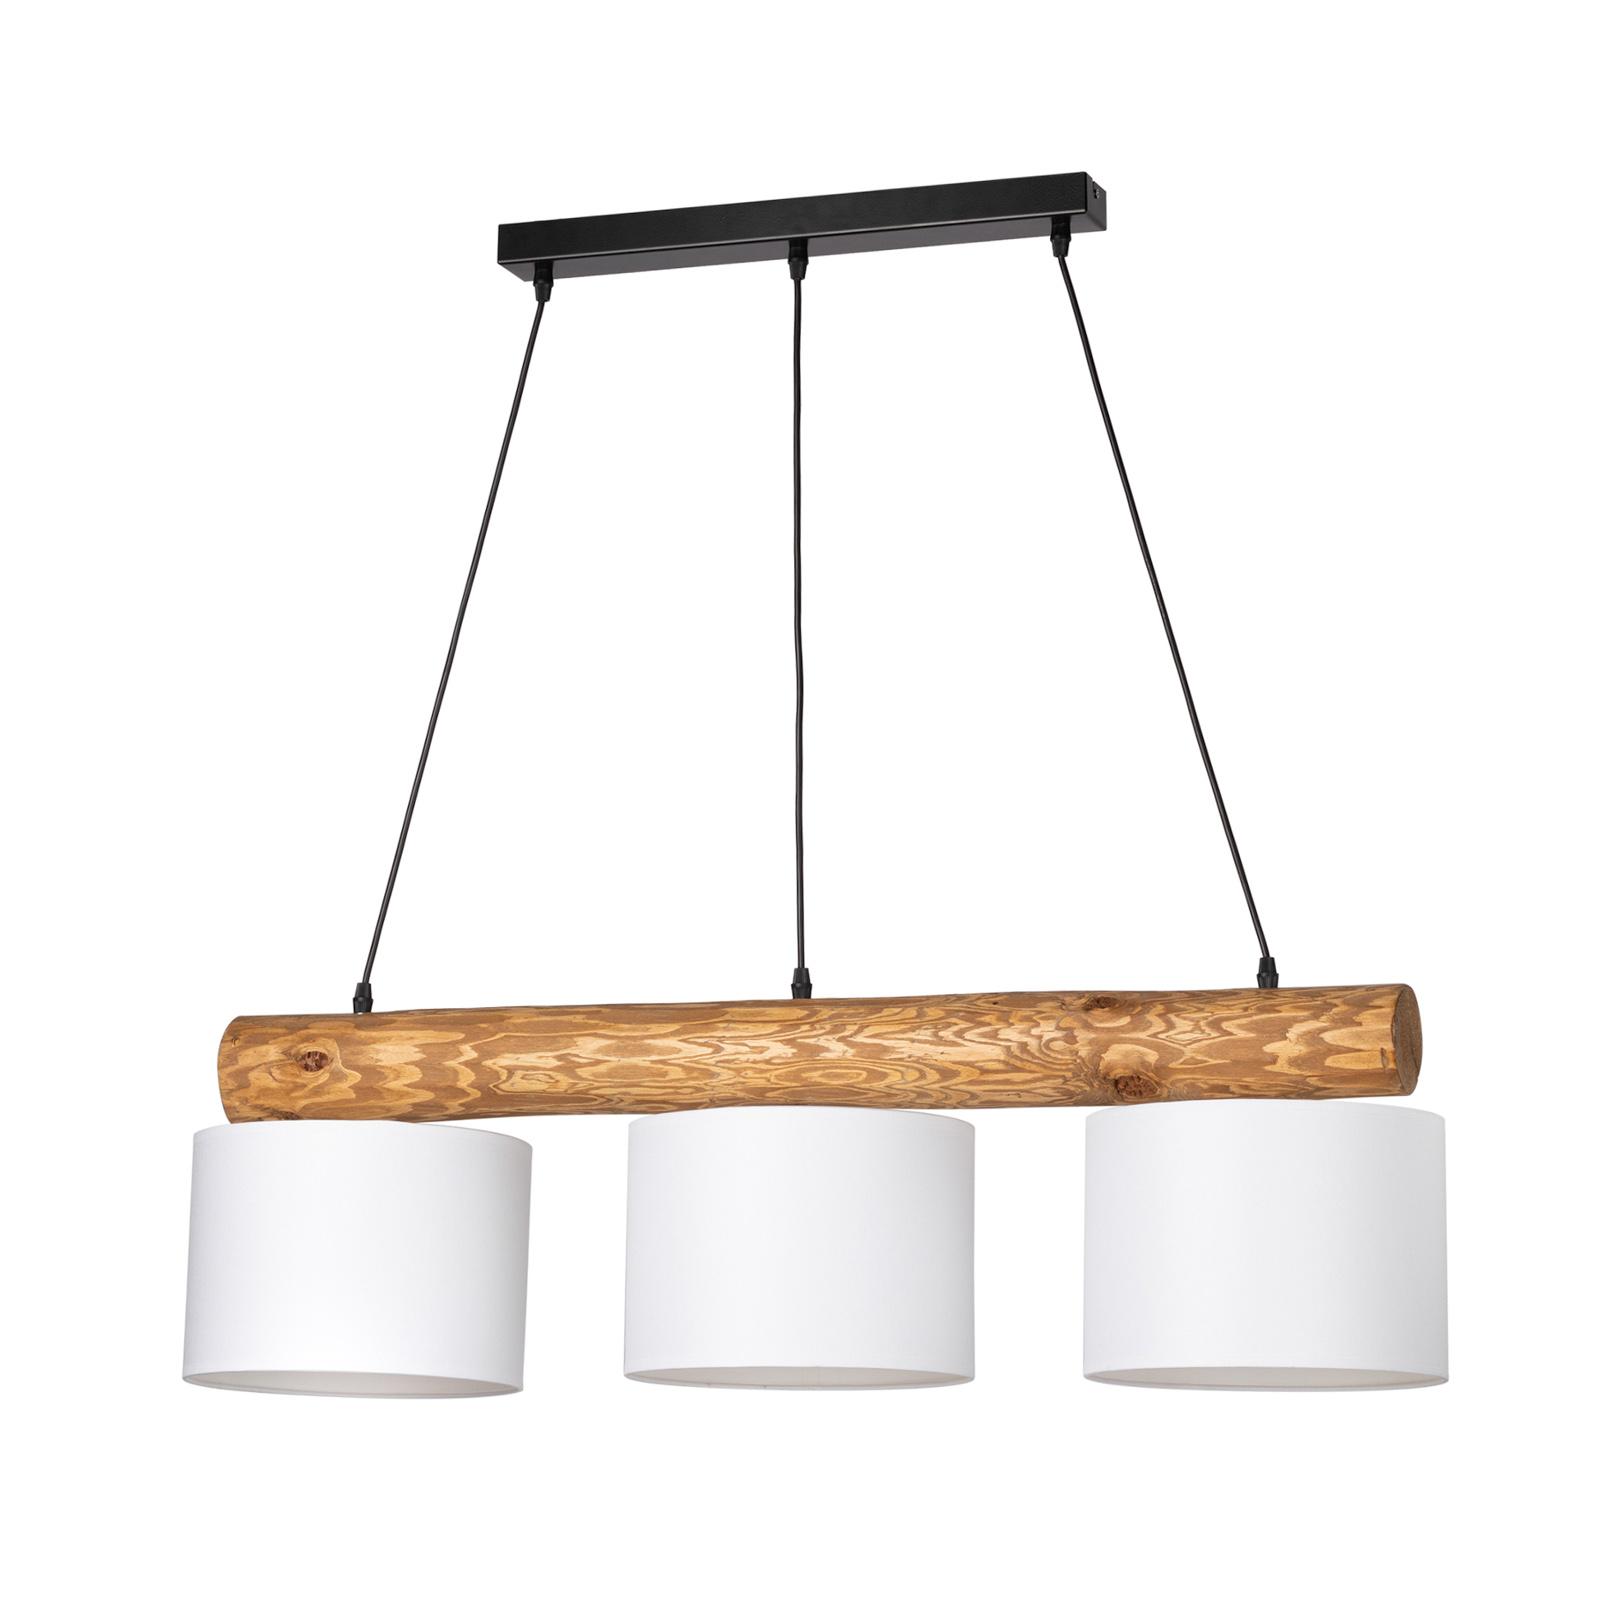 Pino Simpel hængelampe, hvid skærm, brun stang